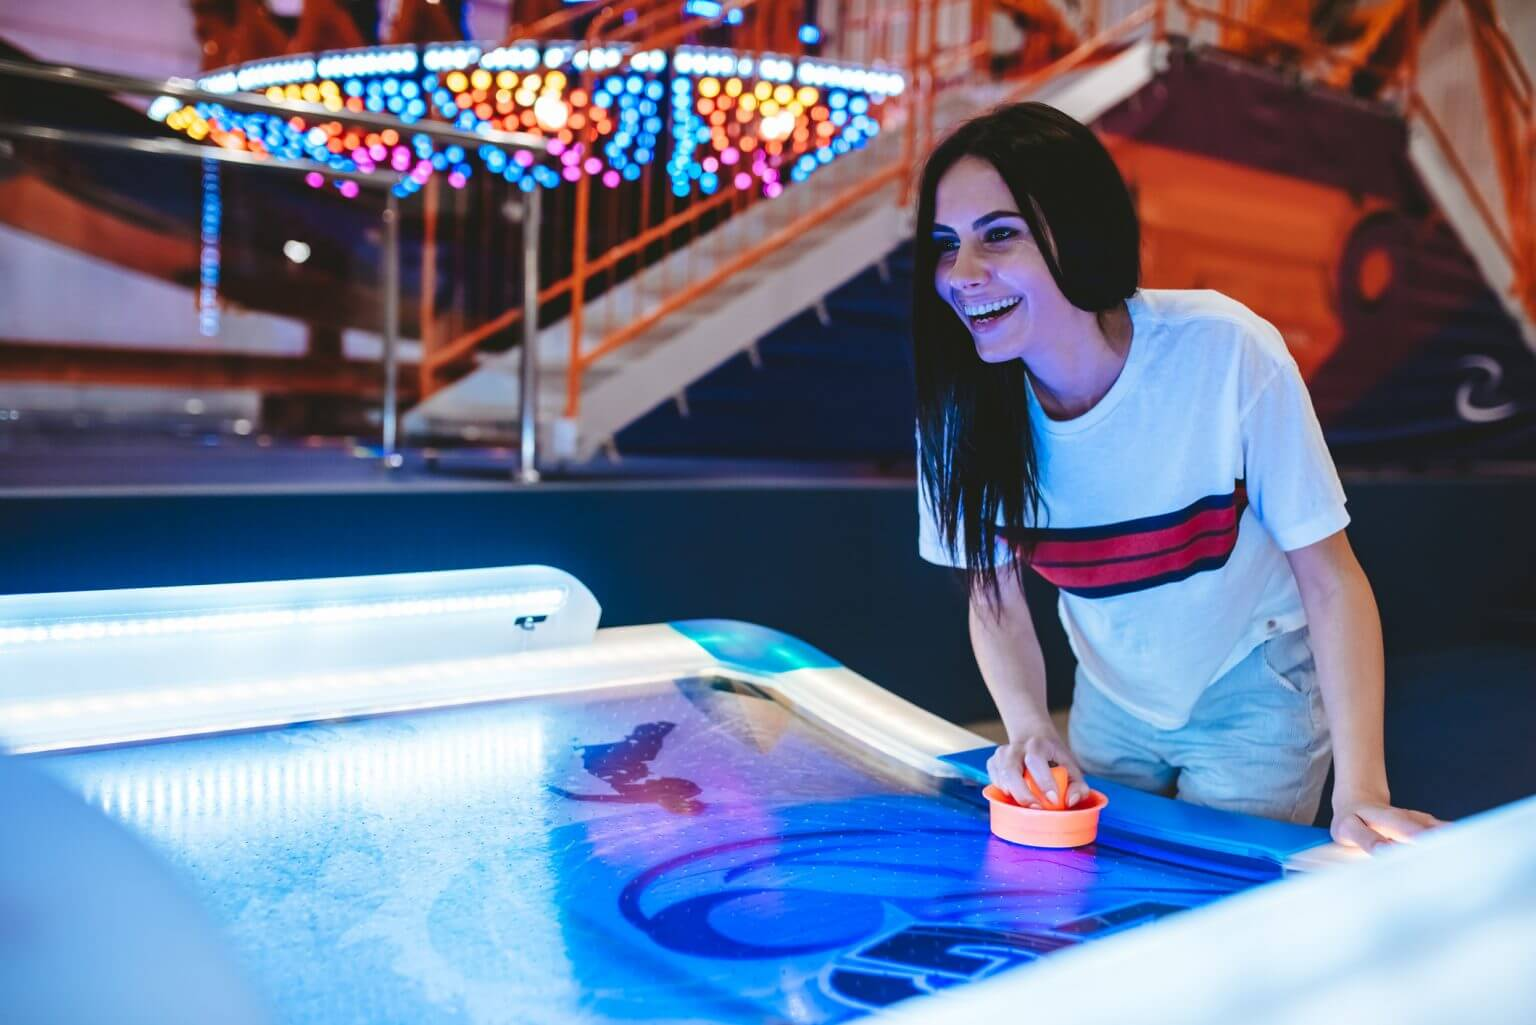 girl playing air hockey in arcade